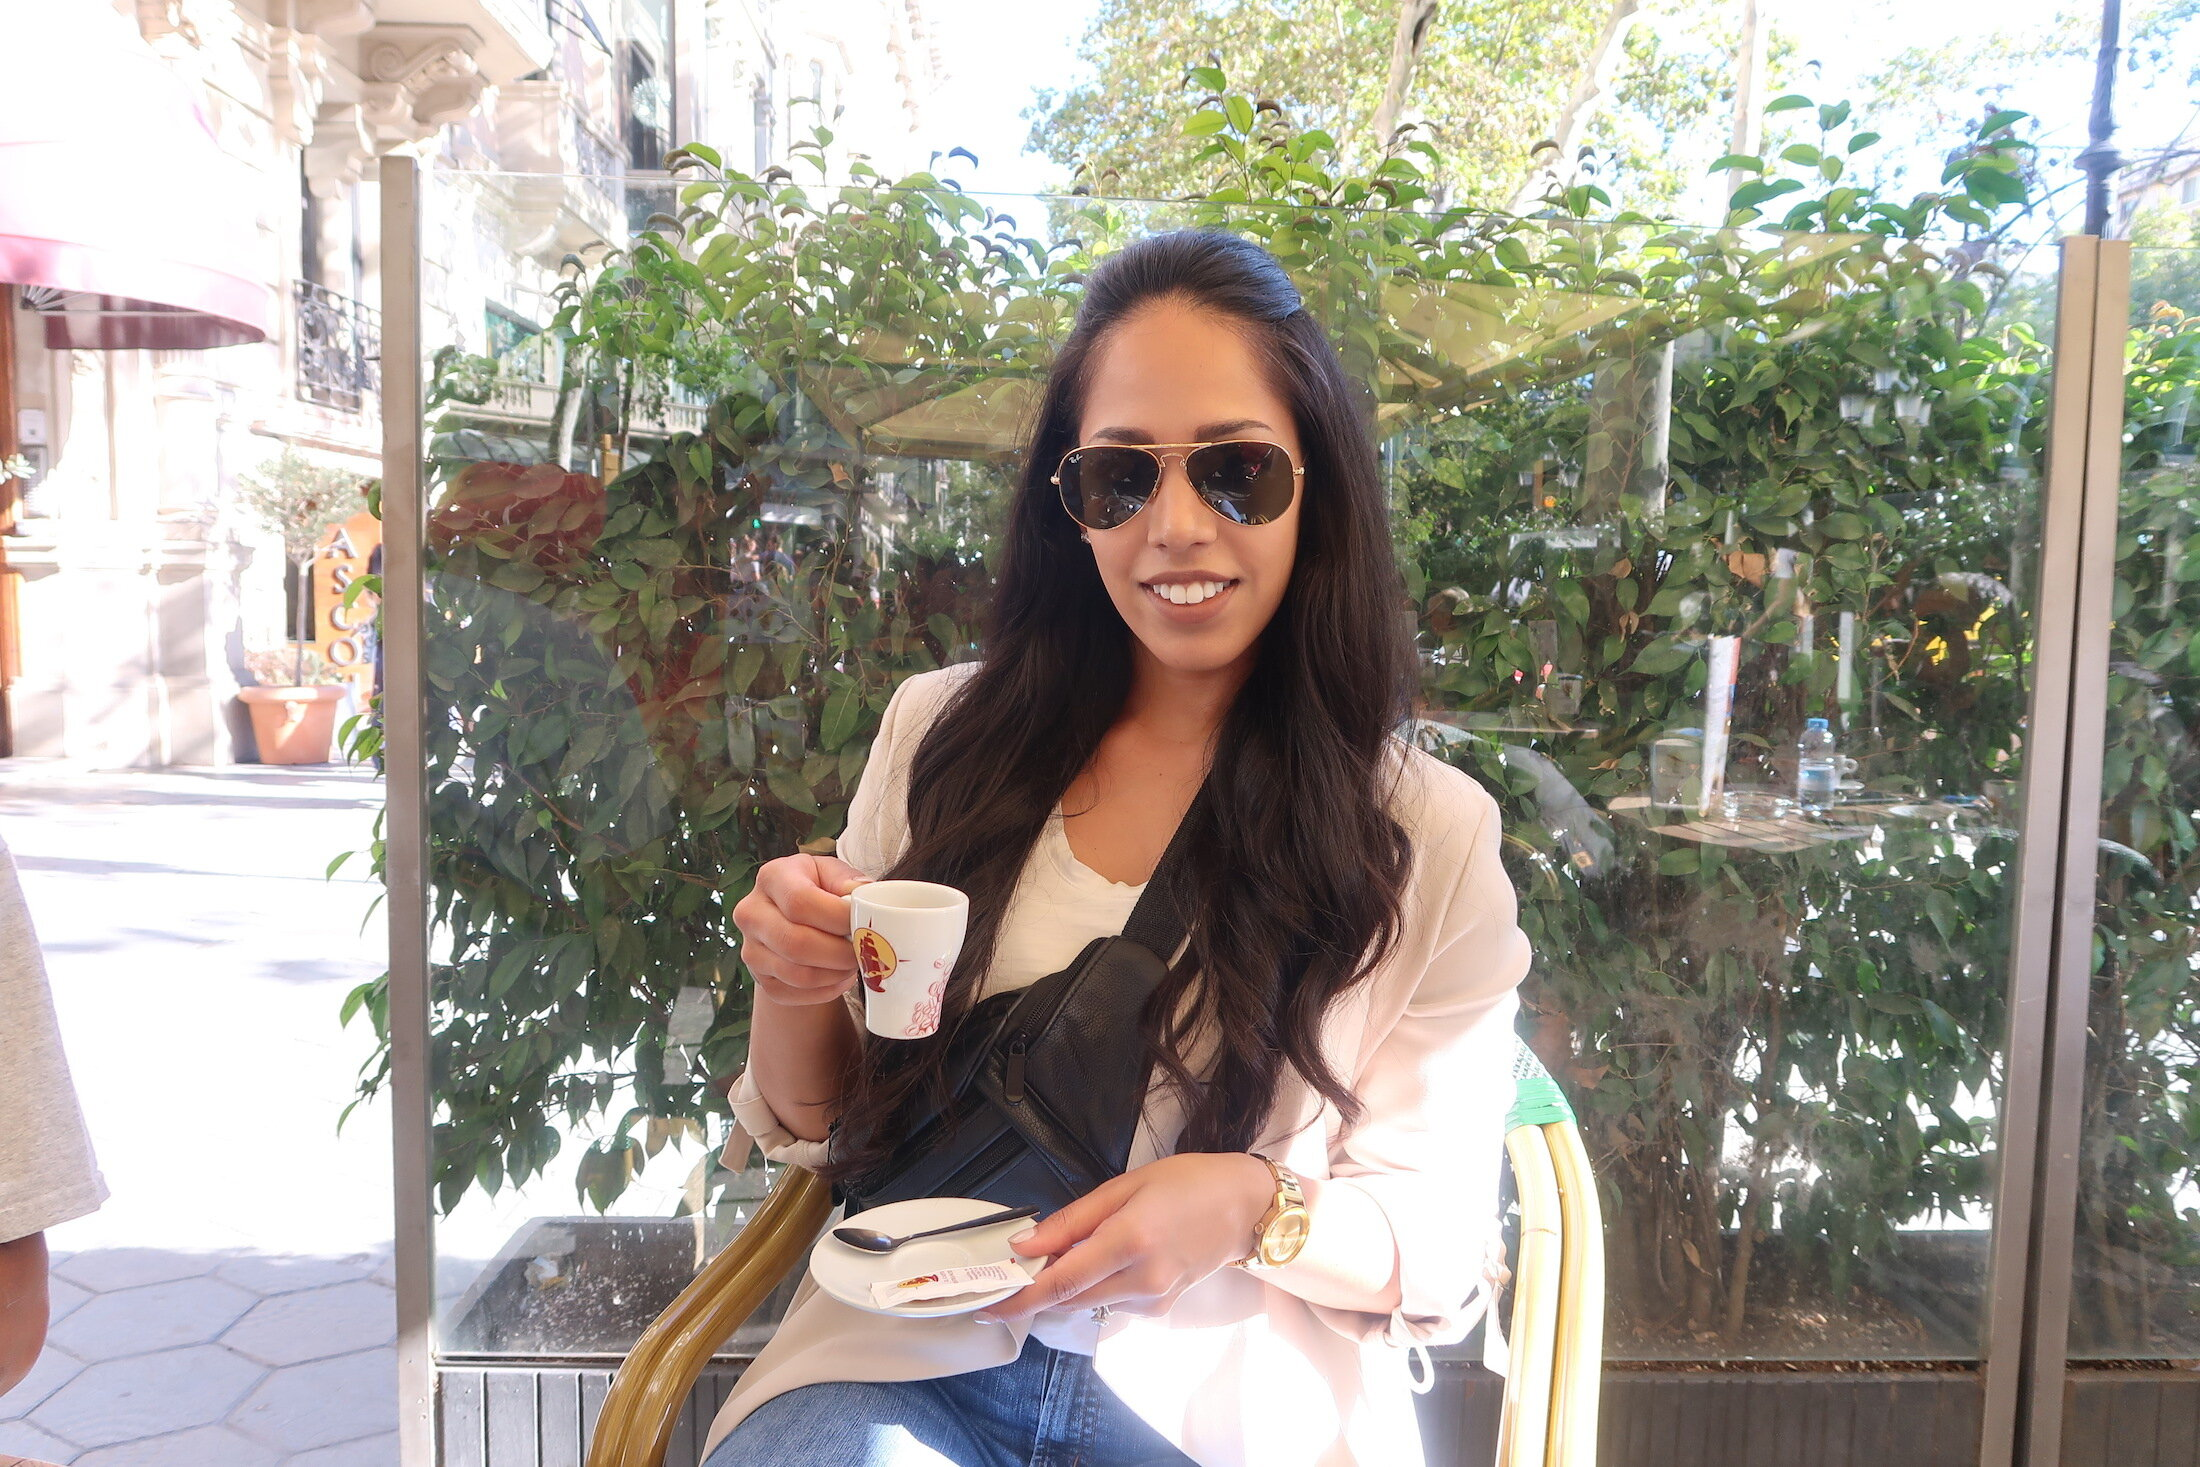 barcelona-spain-fashion-blogger-drinking-espresso.JPG